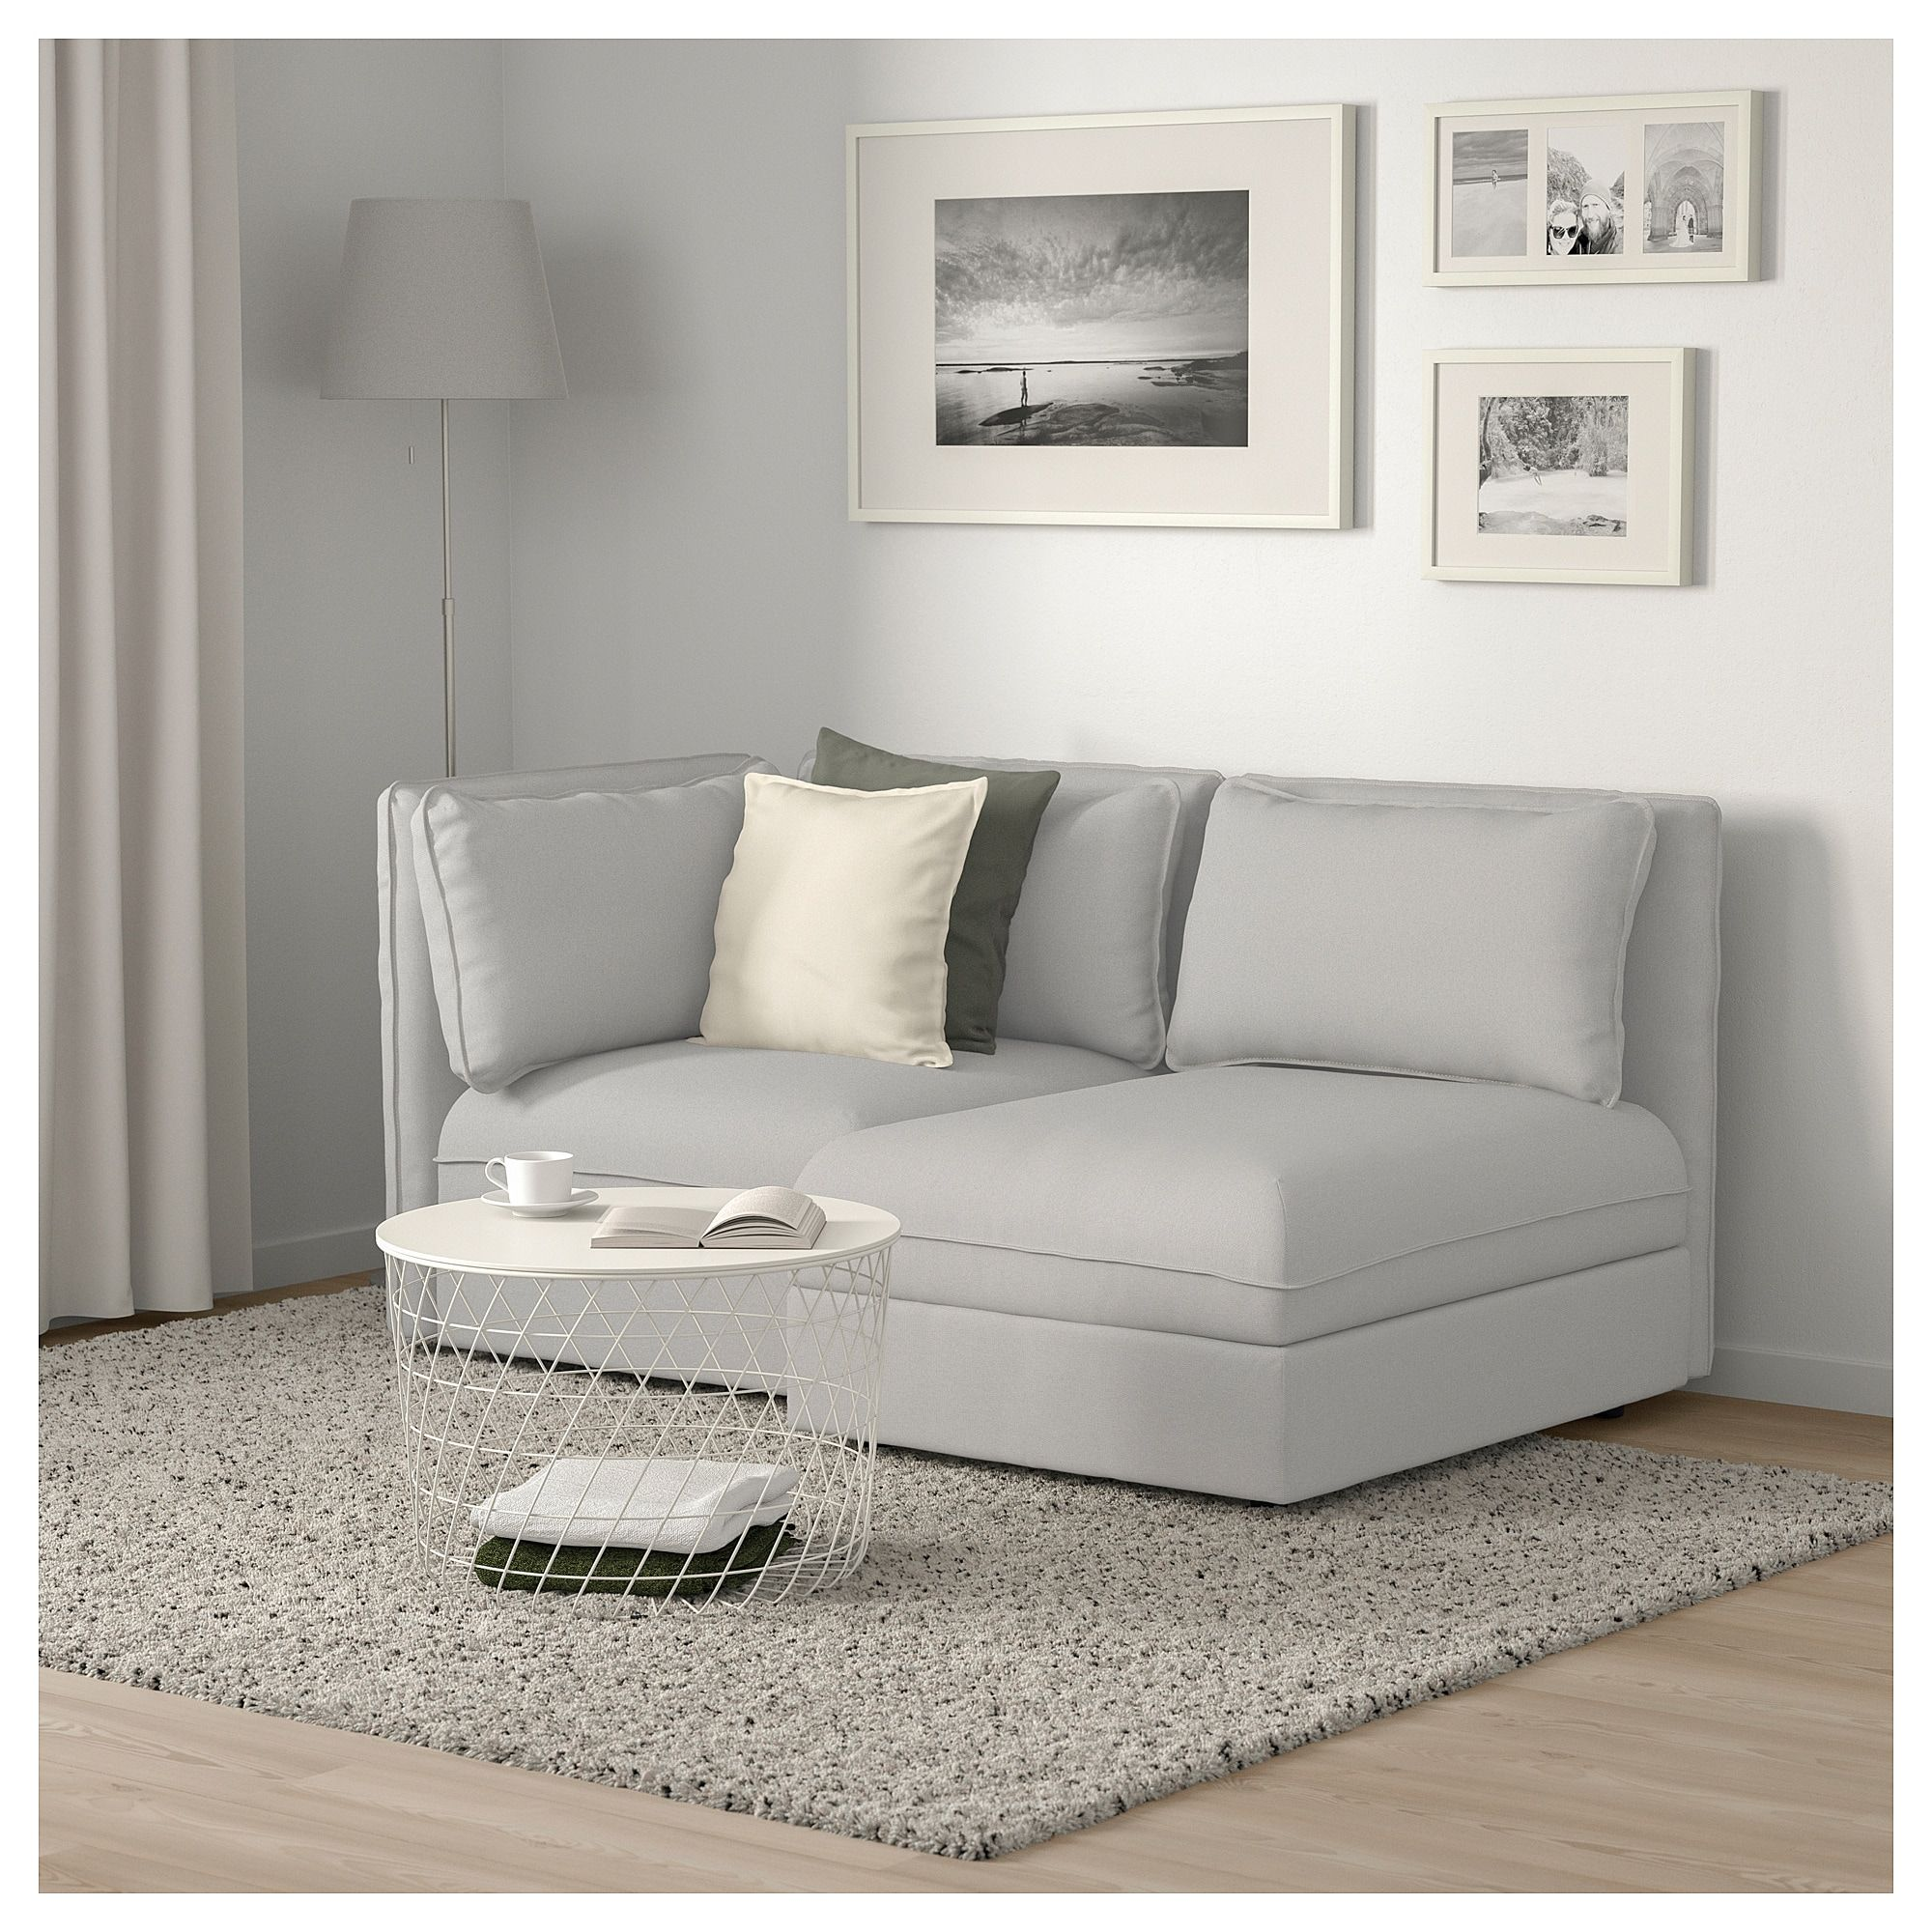 Strange Ikea Vallentuna Modular Loveseat With Storage Orrsta Pabps2019 Chair Design Images Pabps2019Com